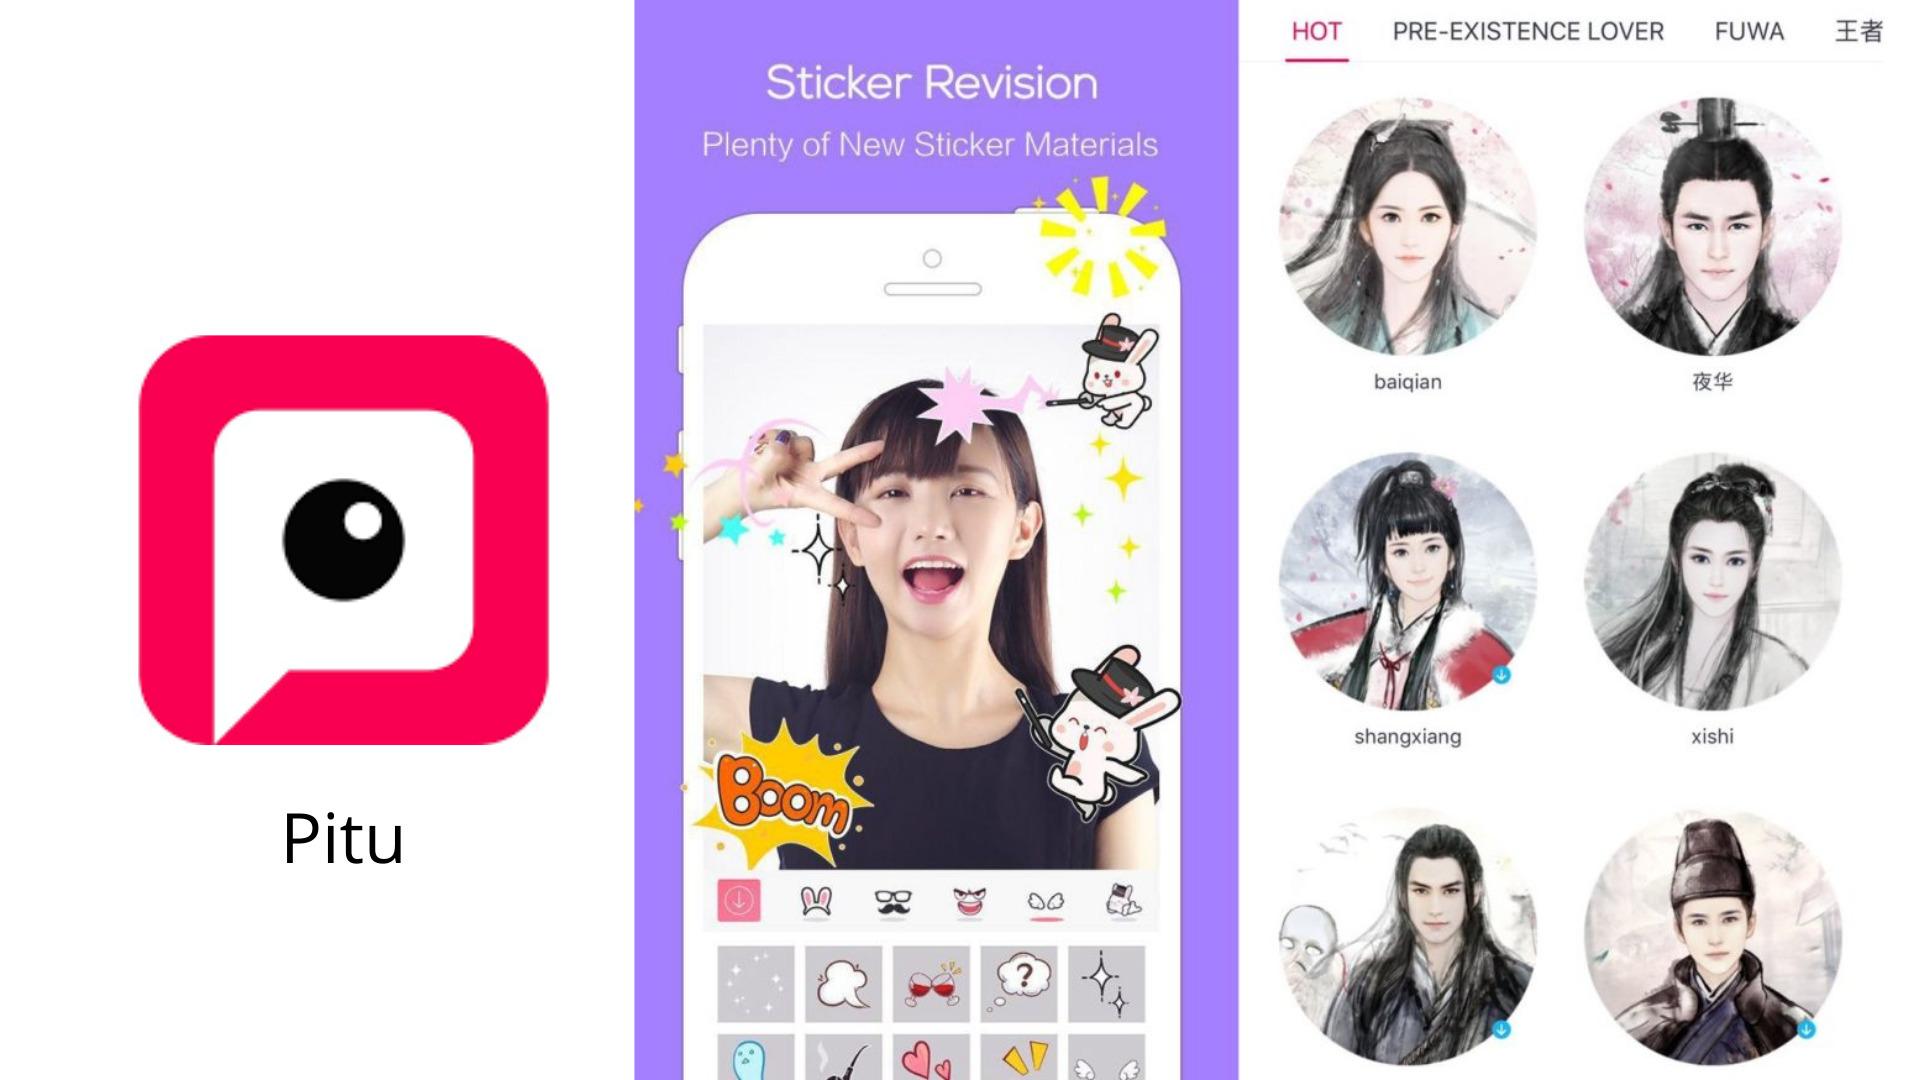 App chụp ảnh đẹp trên iOS - Pitu